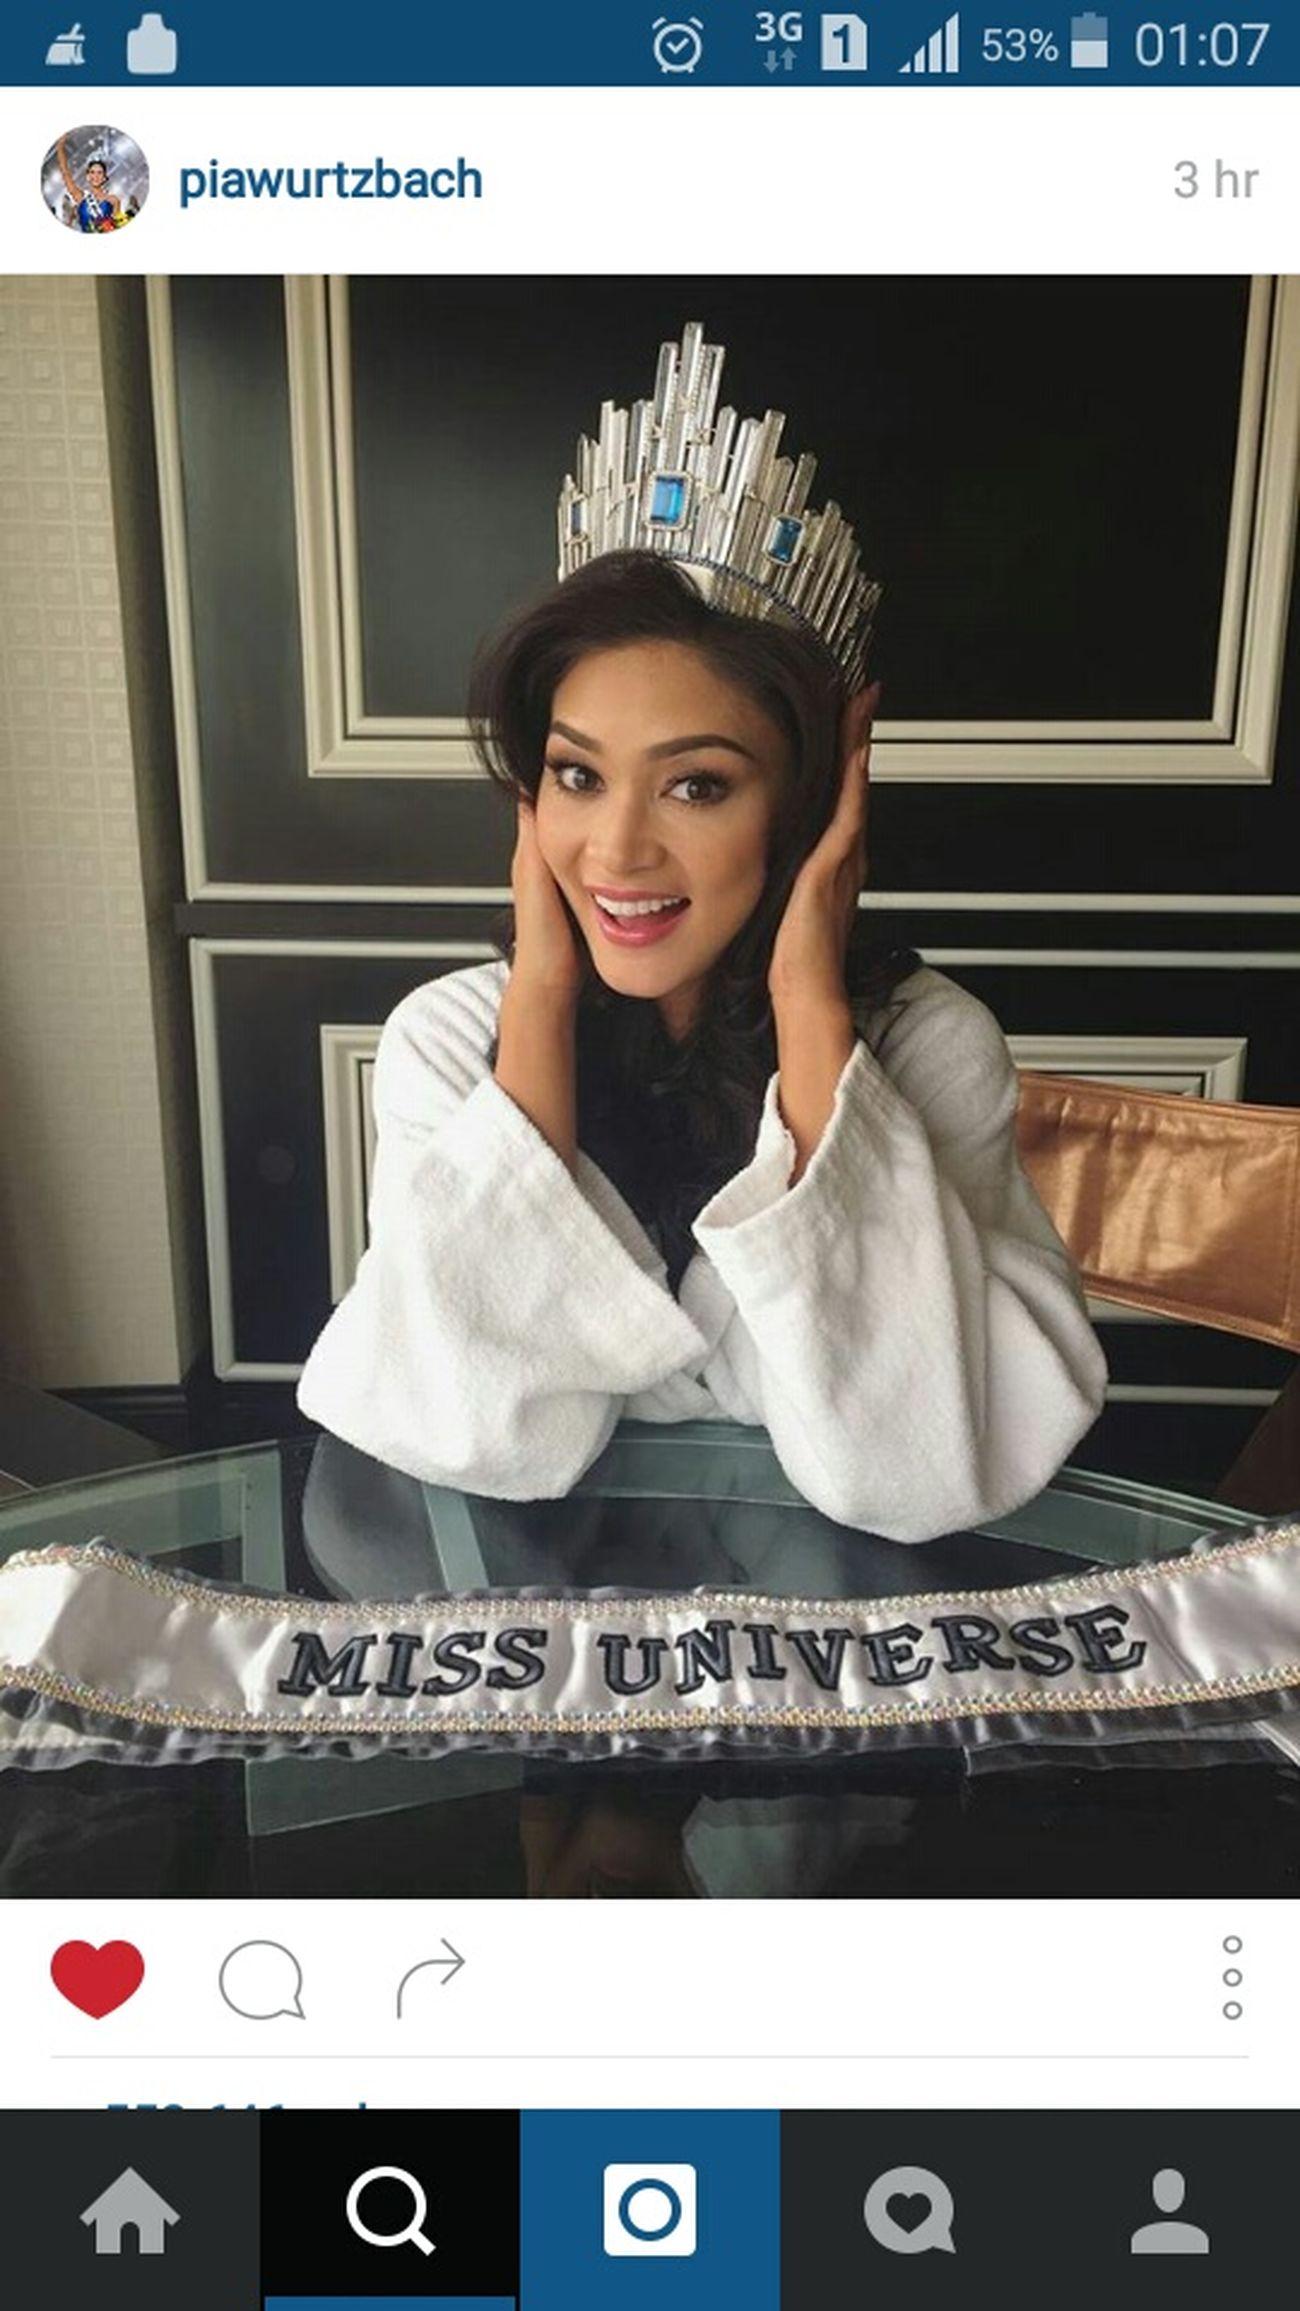 Congratulations Missuniverse2015 MissUniverso Missphilippines Piawurtzbach 👏👍👌😘 Mabuhay Mahal Kita